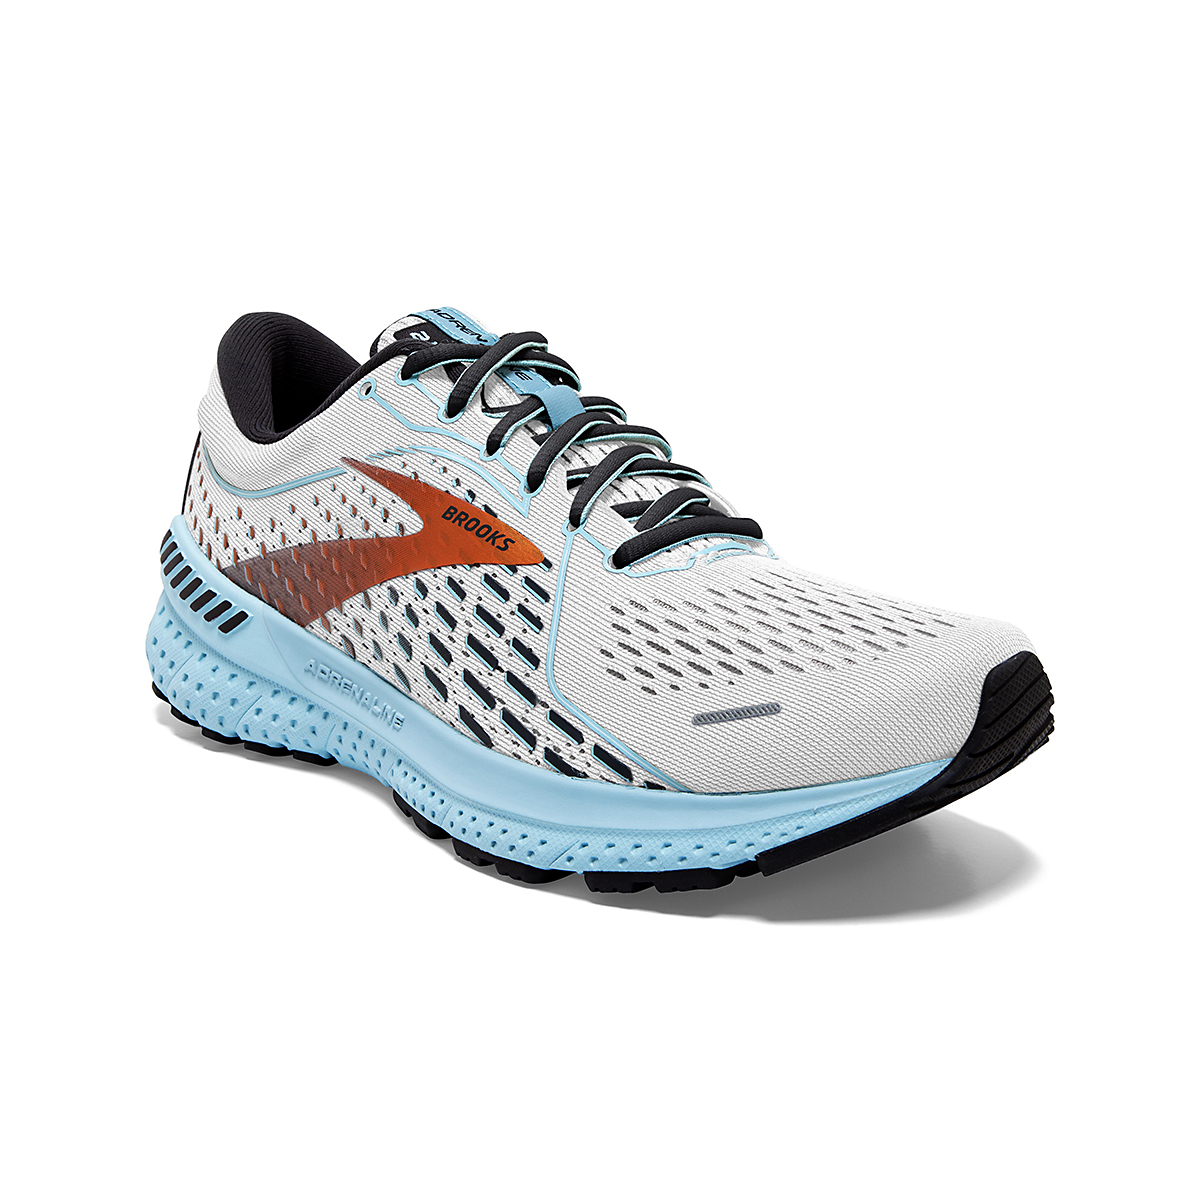 Women's Brooks Adrenaline GTS 21 Running Shoe - Color: White/Alloy - Size: 5 - Width: Regular, White/Alloy, large, image 3